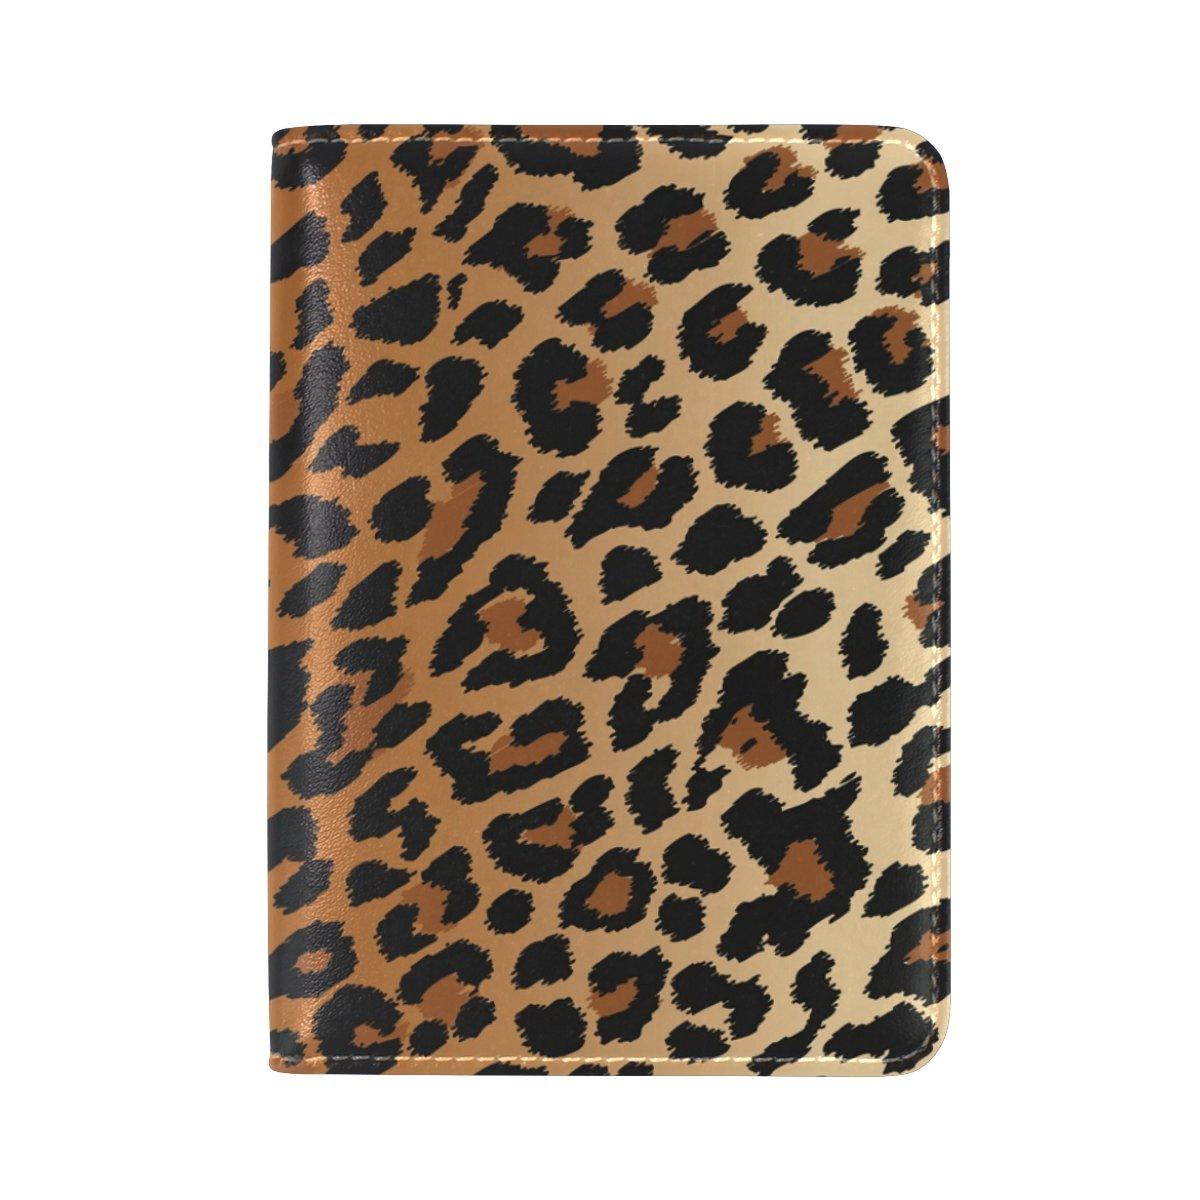 Sexy Leopard Grain Genuine Leather UAS Passport Holder Travel Wallet Cover Case